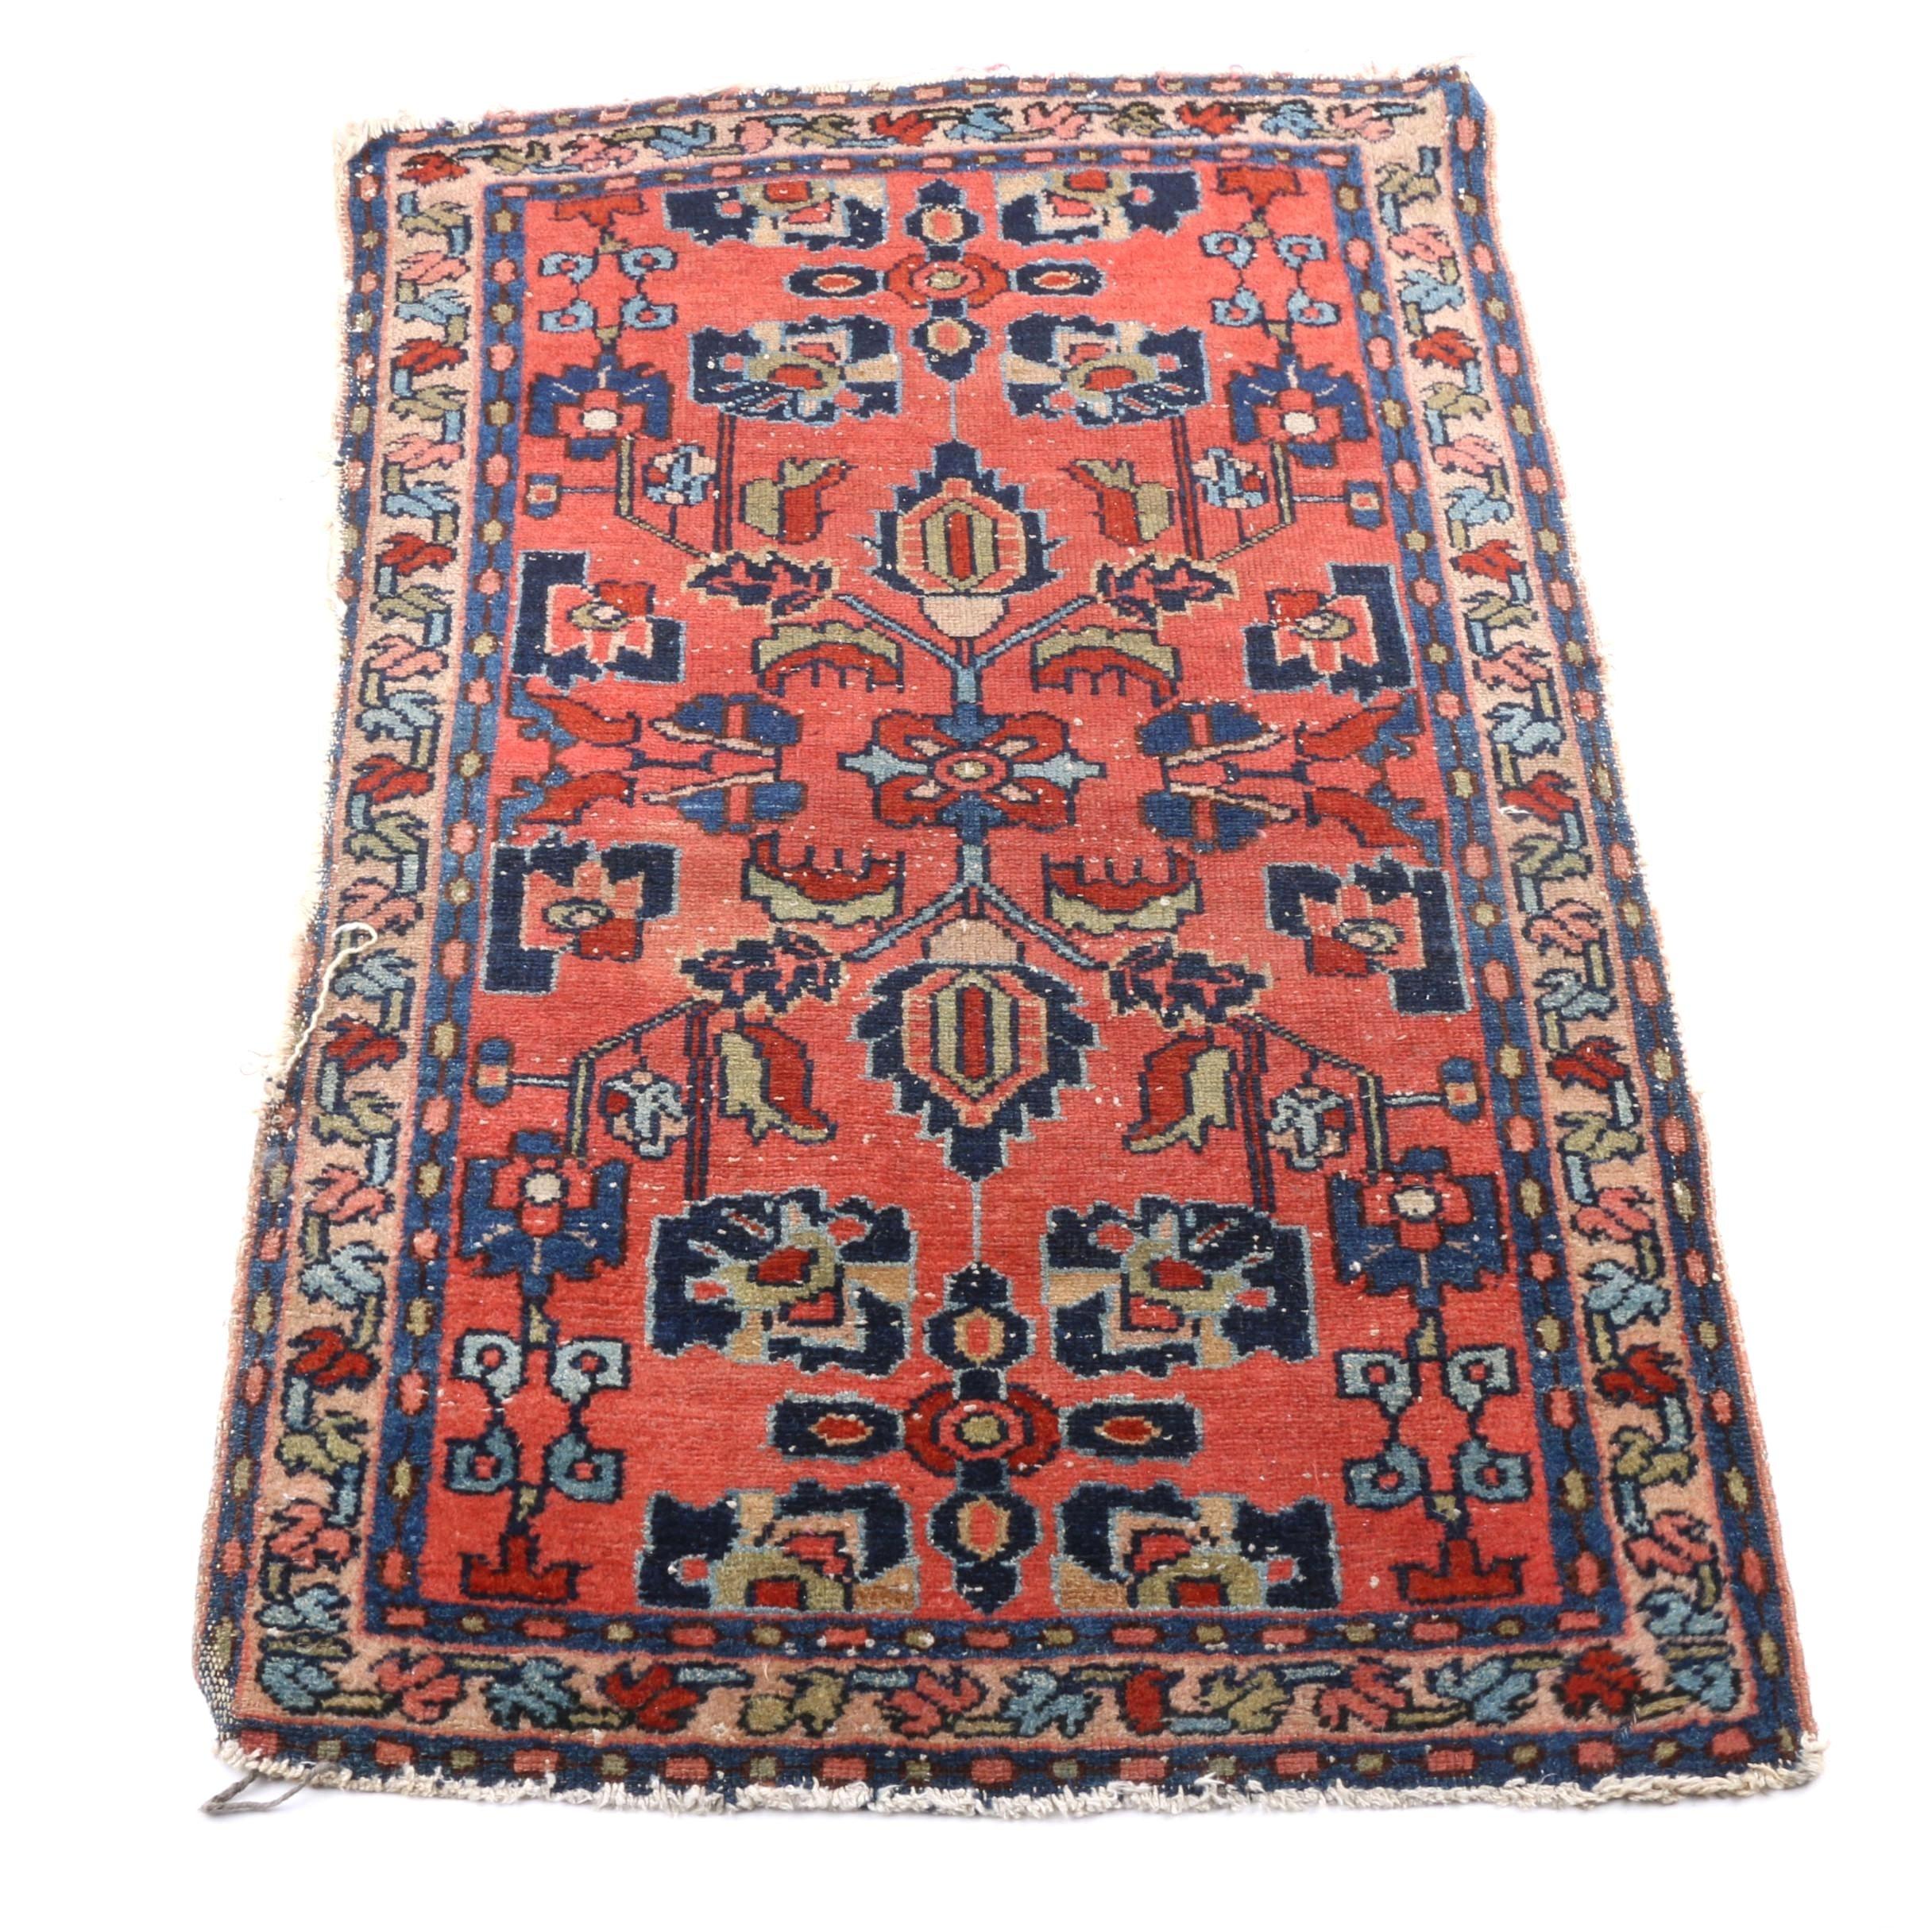 Small Semi-Antique Persian Hand Woven Rug